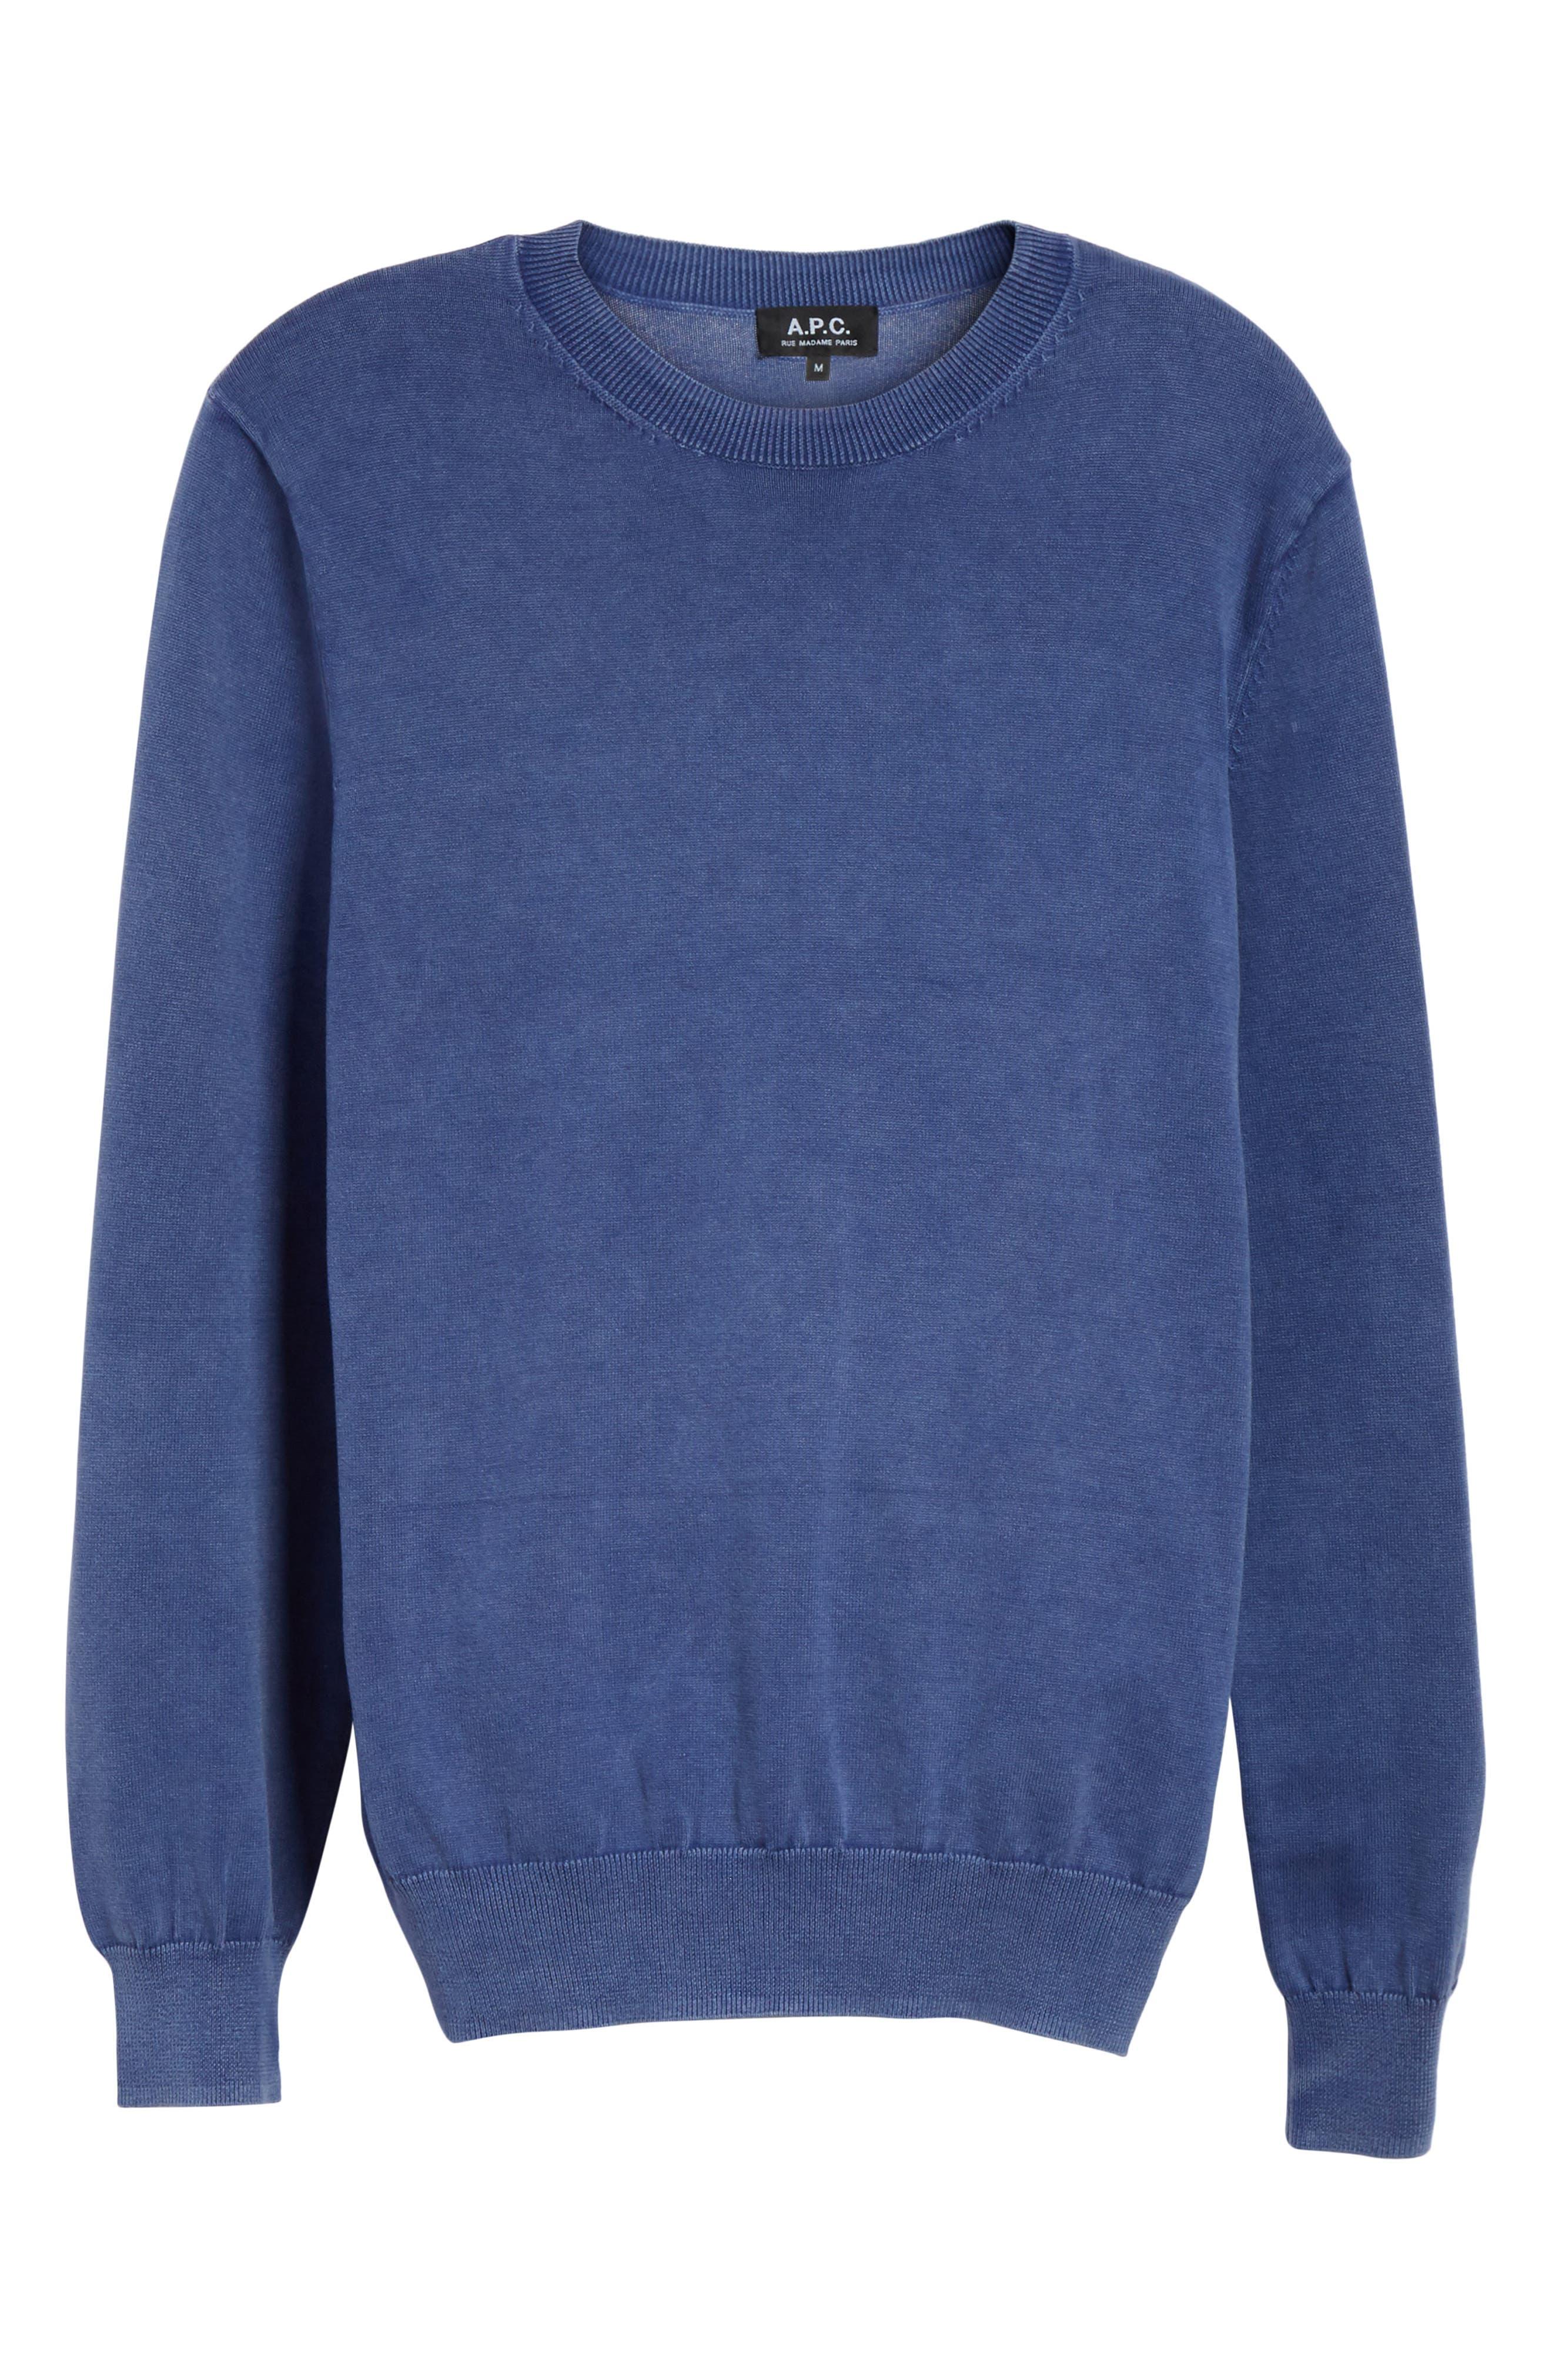 Marvin Crewneck Sweater,                             Alternate thumbnail 6, color,                             410